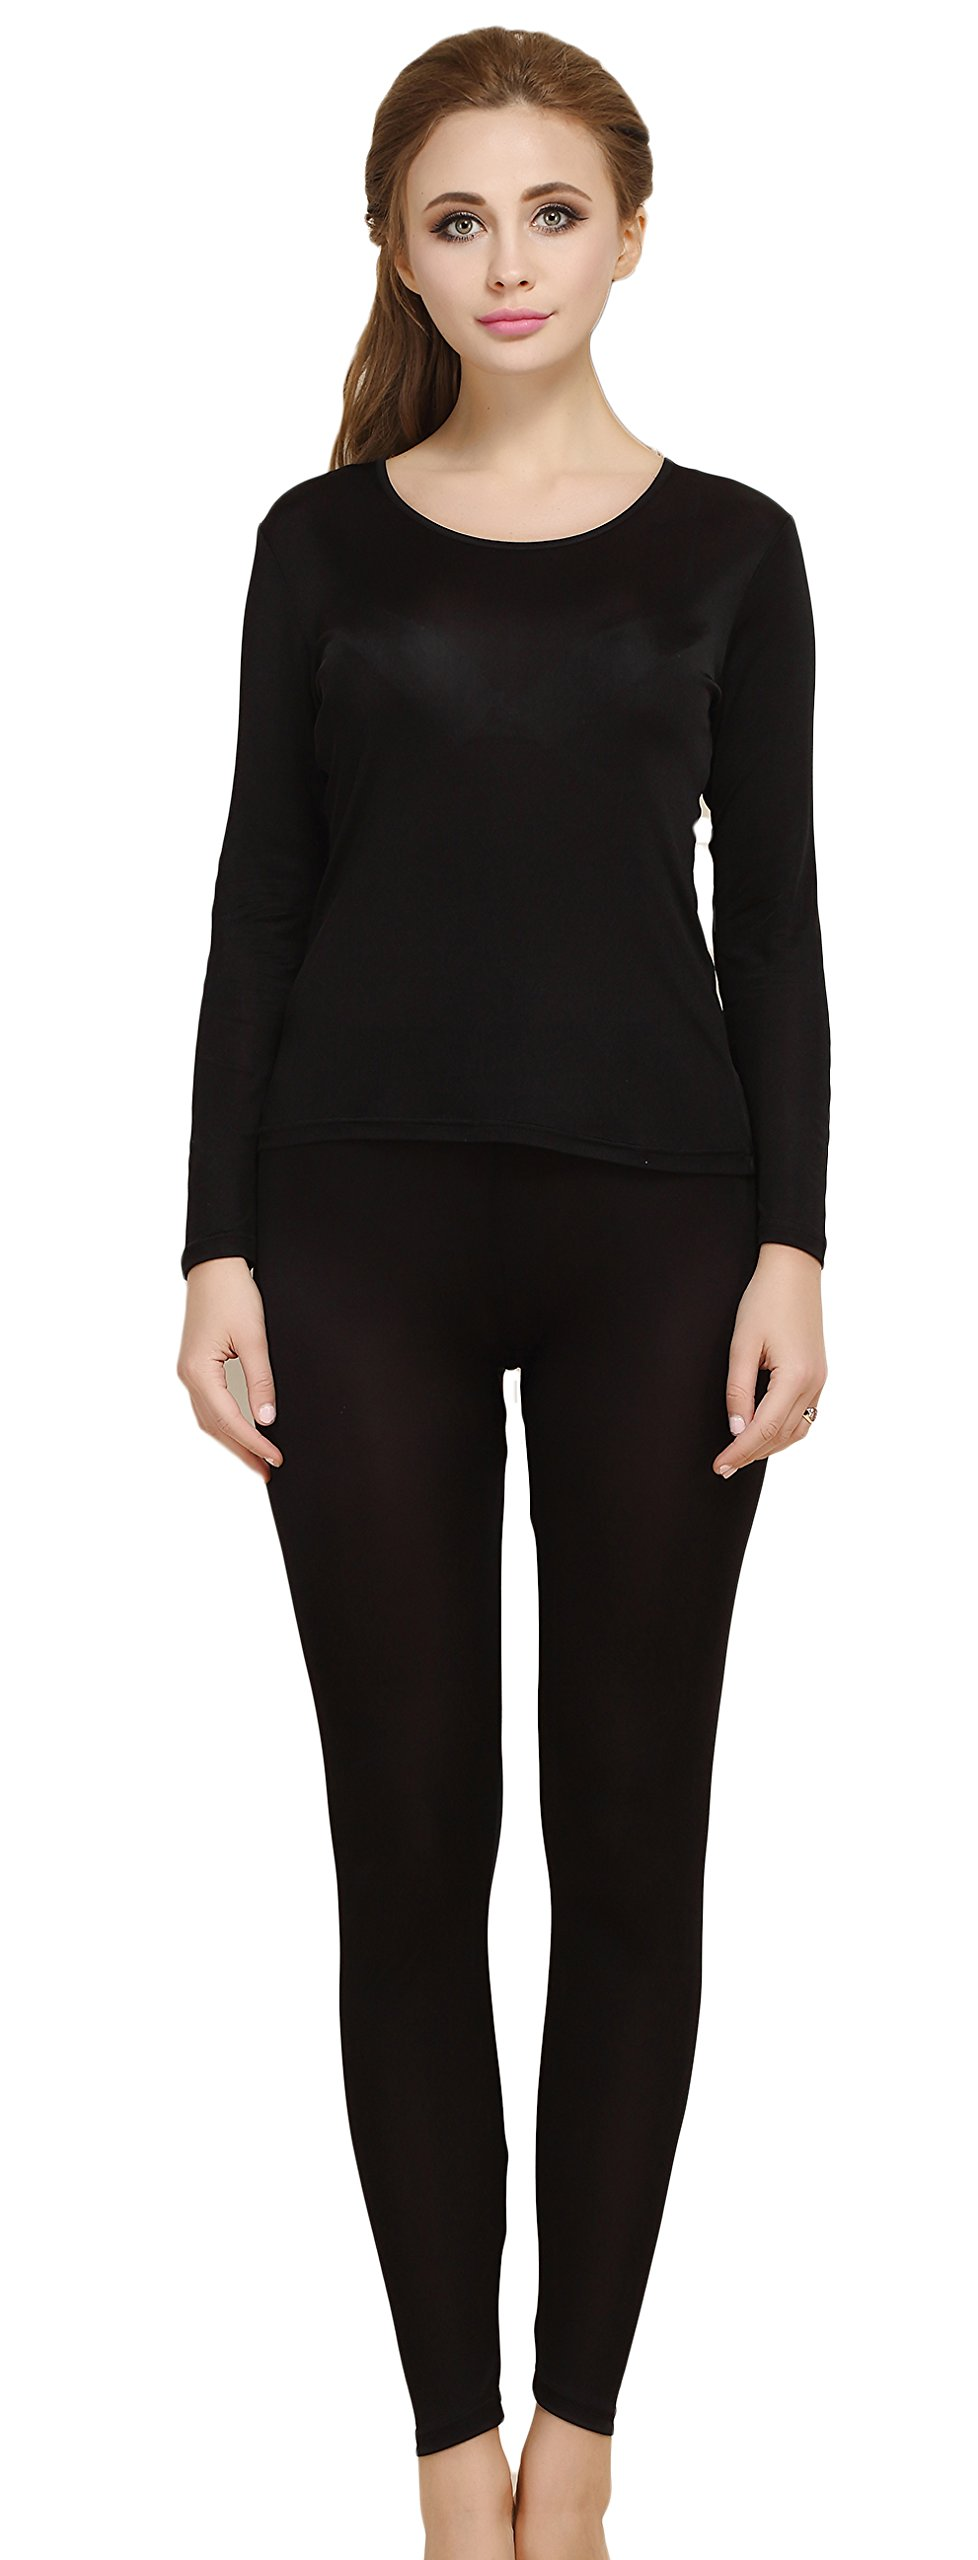 Women's Mulberry Silk Long Sleeve T-Shirt Pants Two Piece Black XL